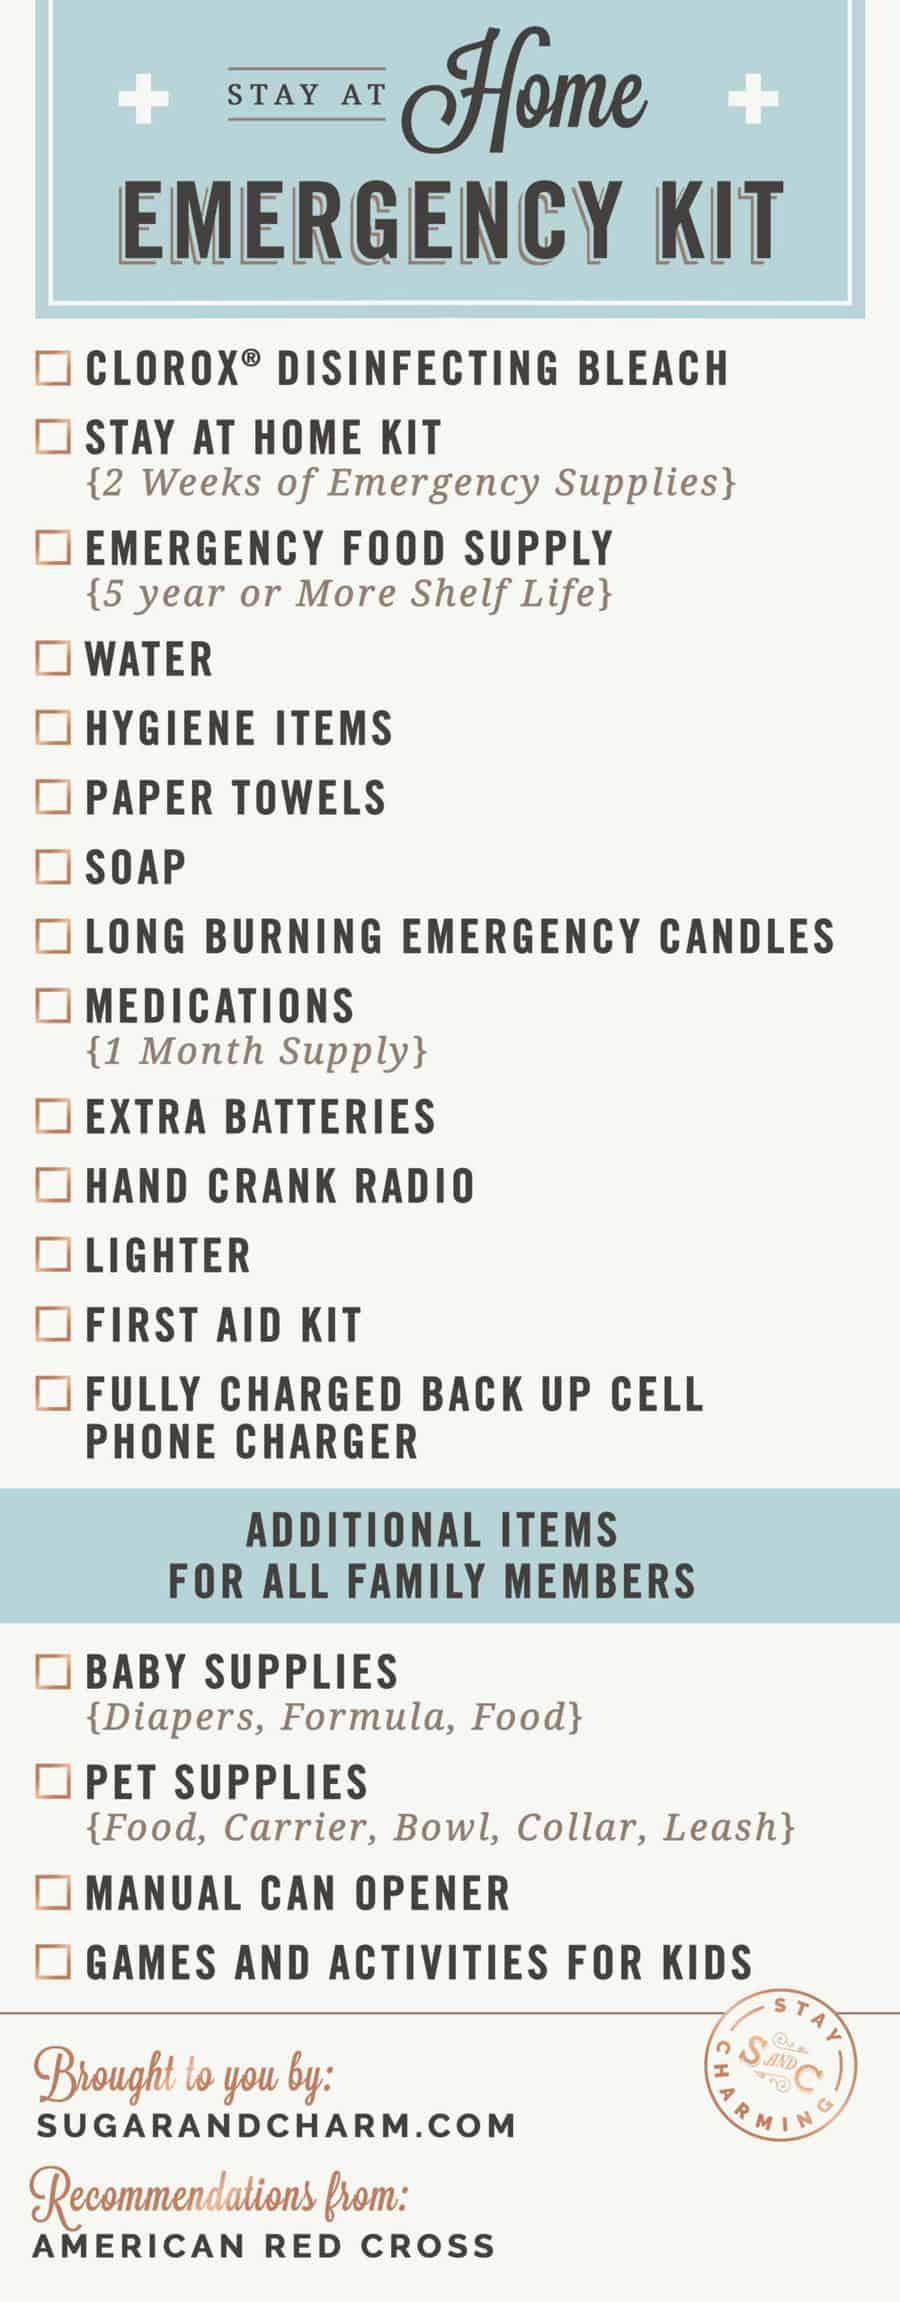 list of items for evacuation kit